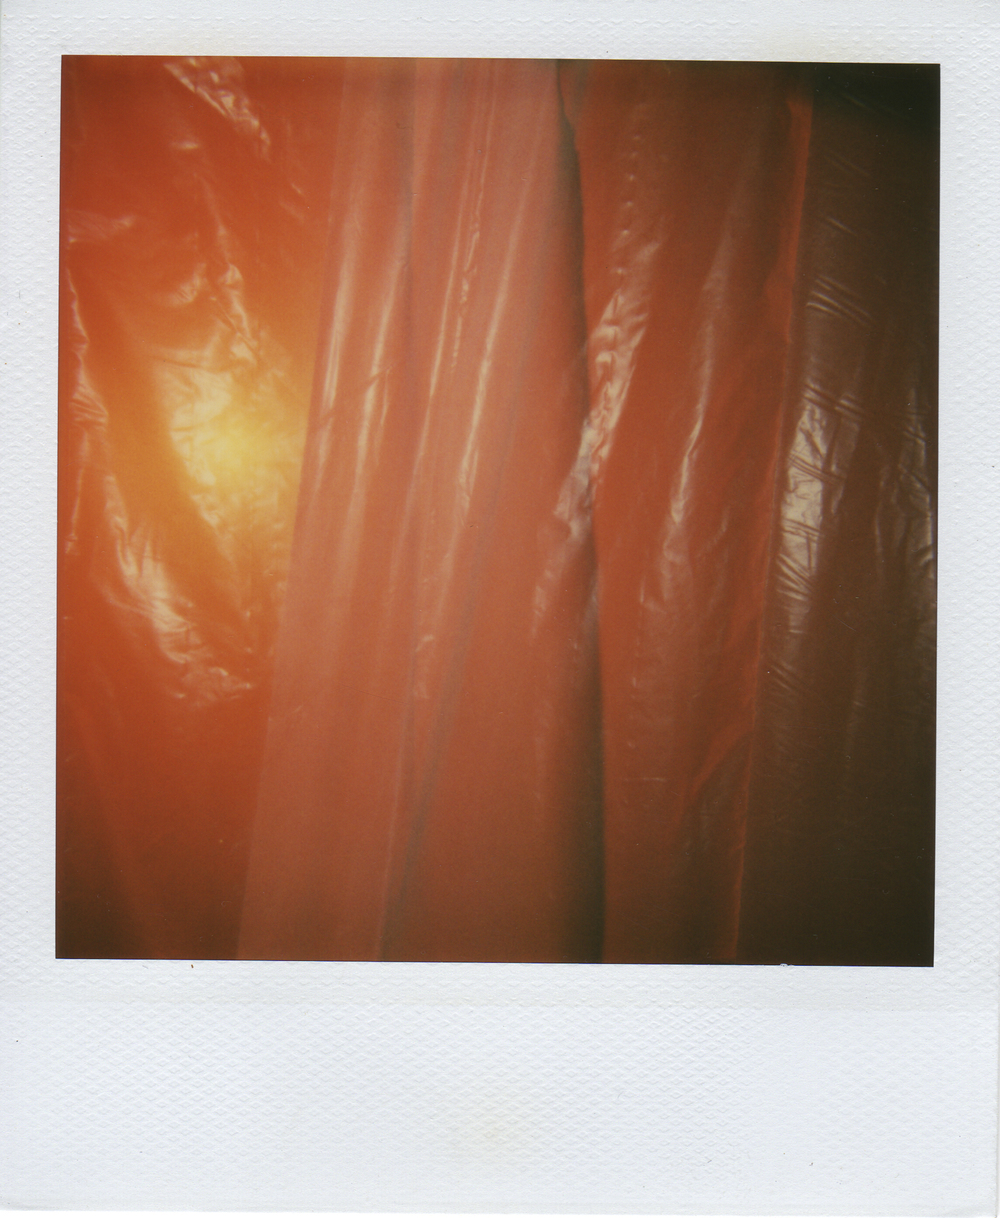 jlaurence-polaroid-151.jpg